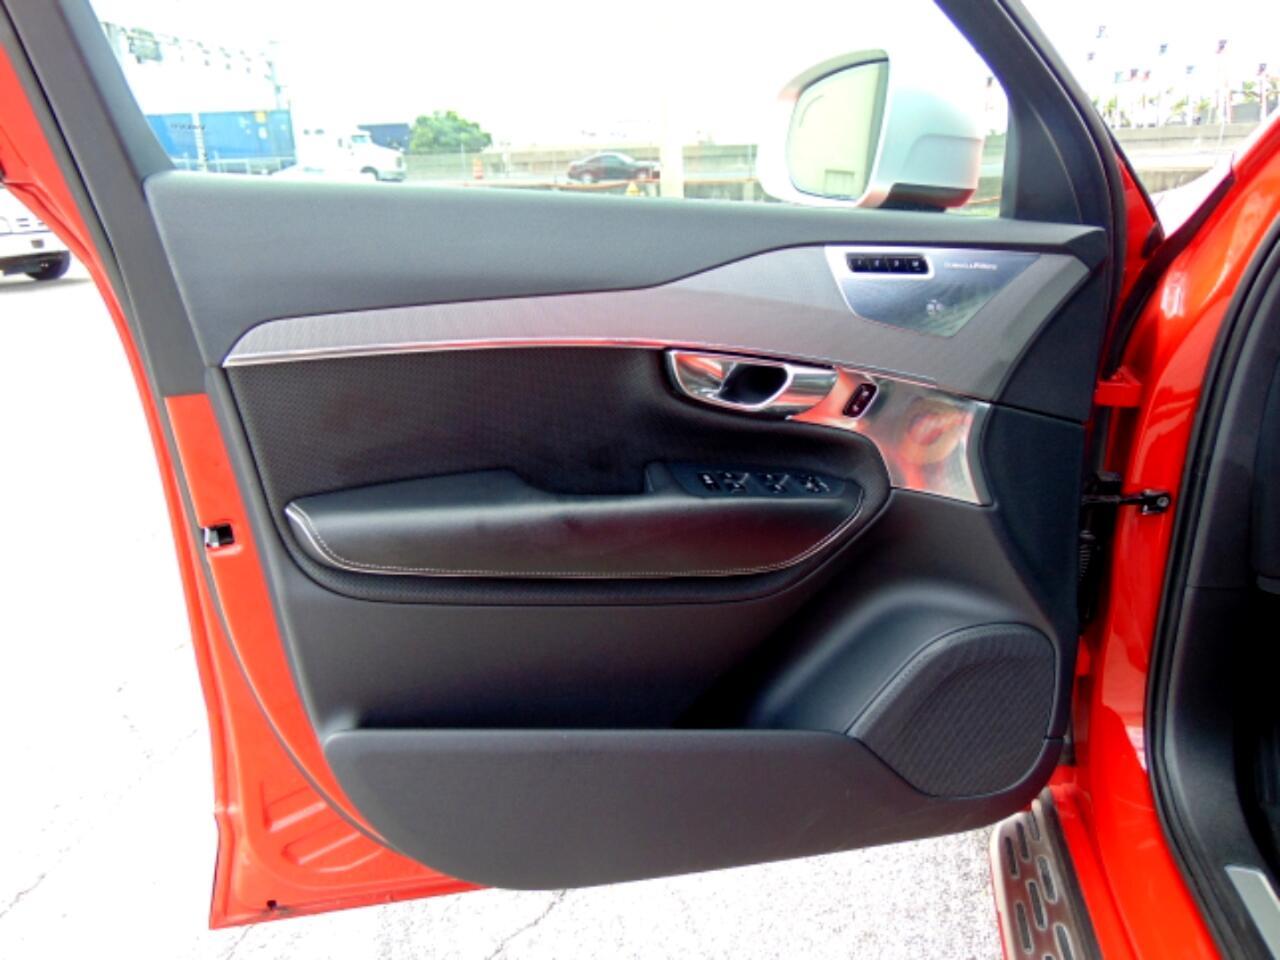 2016 Volvo XC90 AWD 4dr T6 R-Design